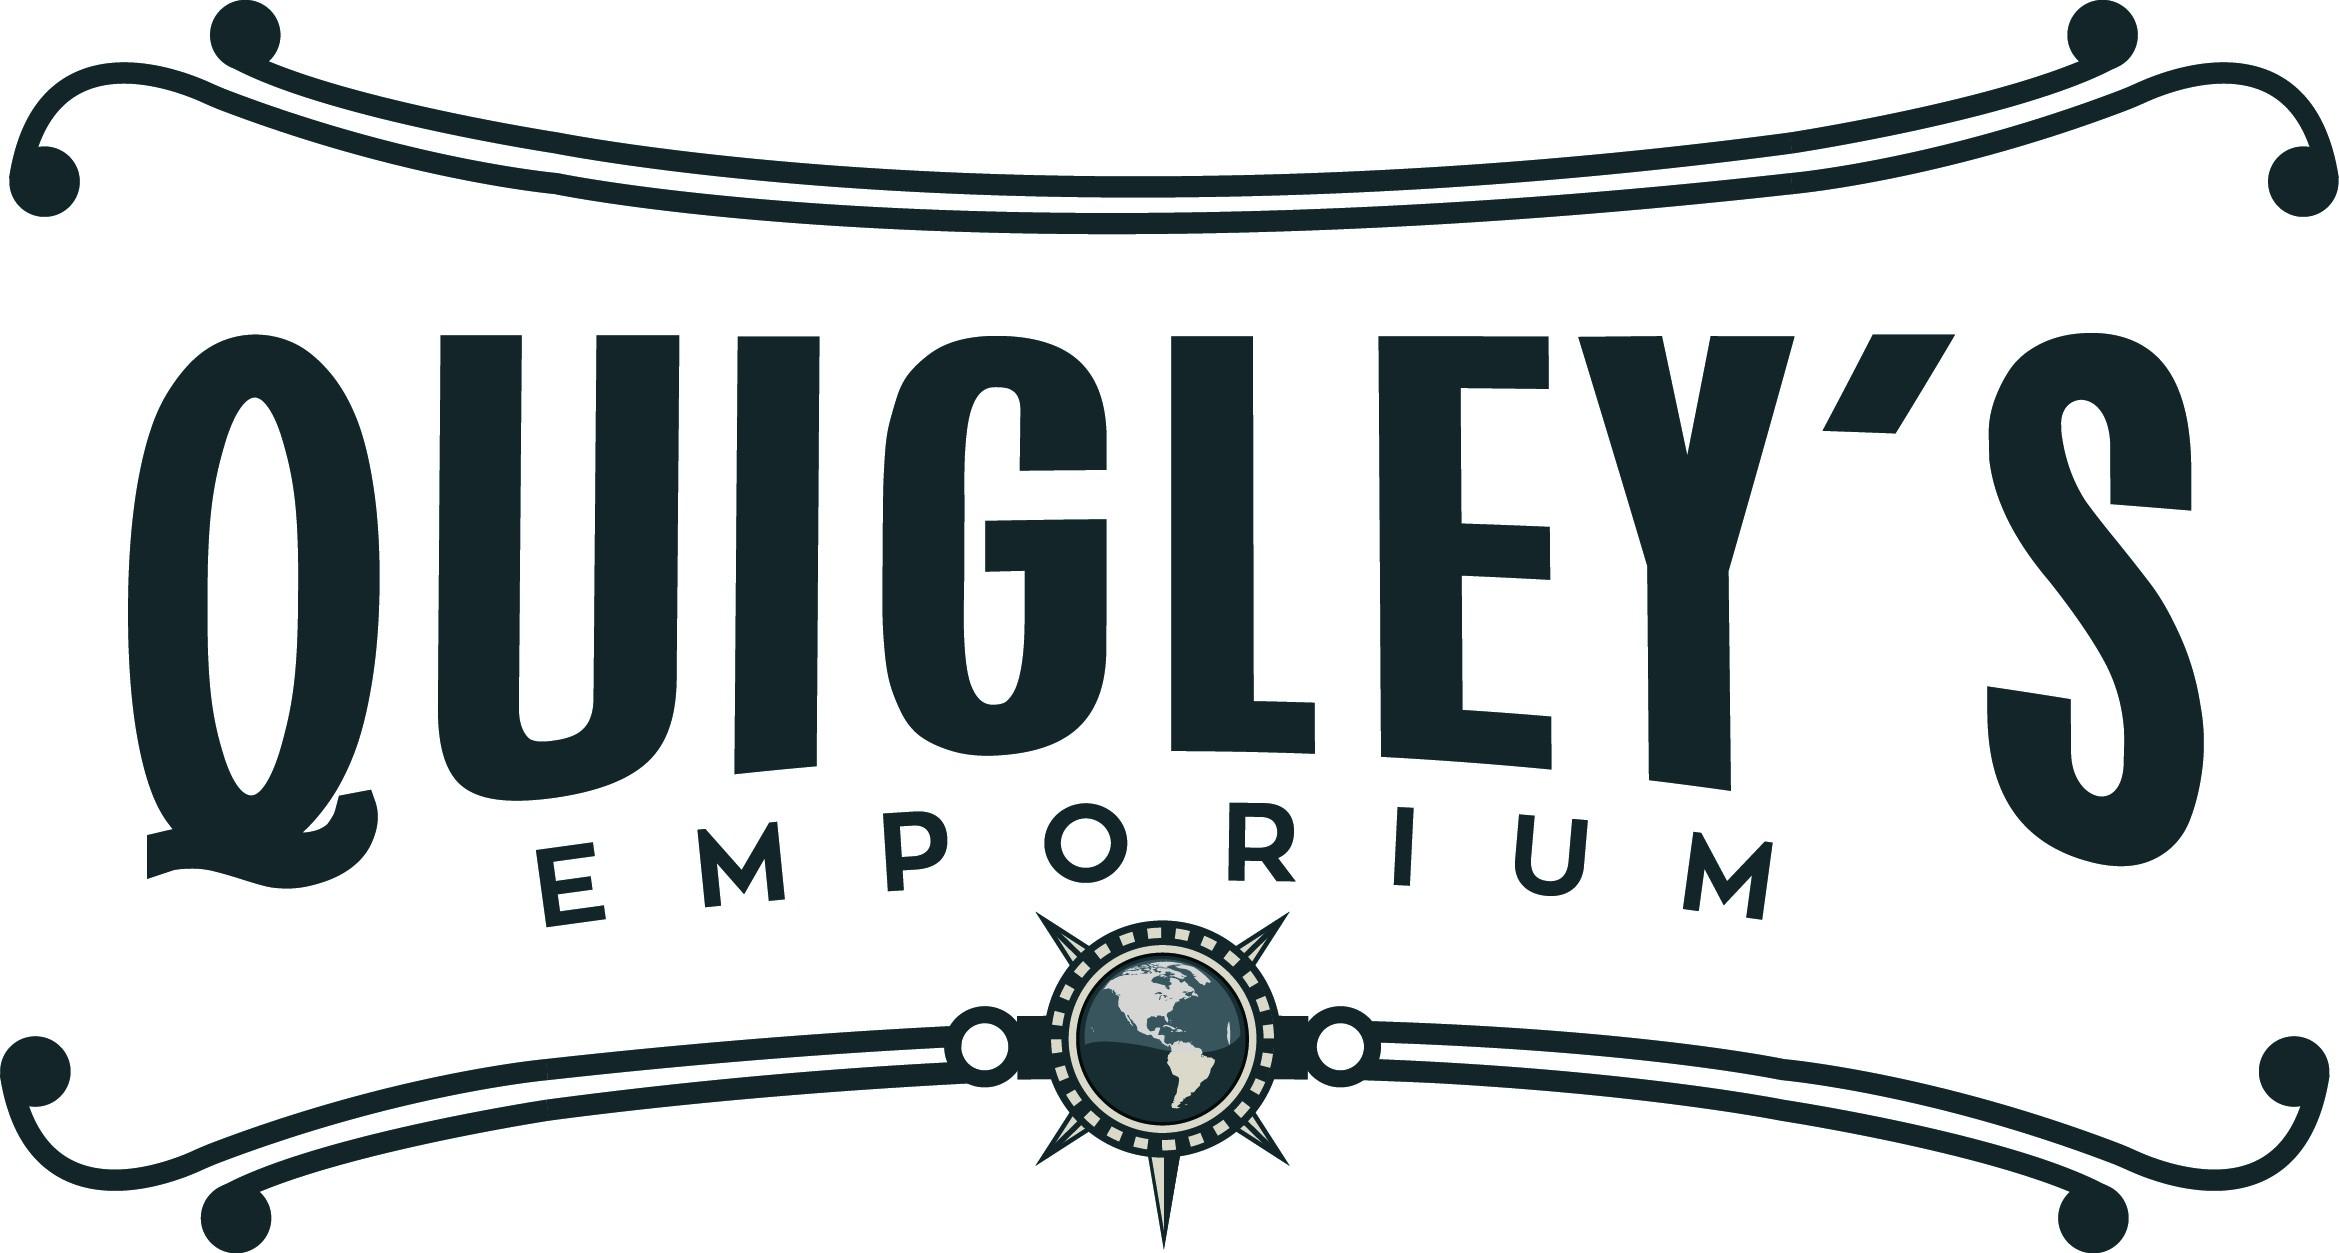 Create a logo for a shopping emporium that has a nostalgic but adventurous feel.